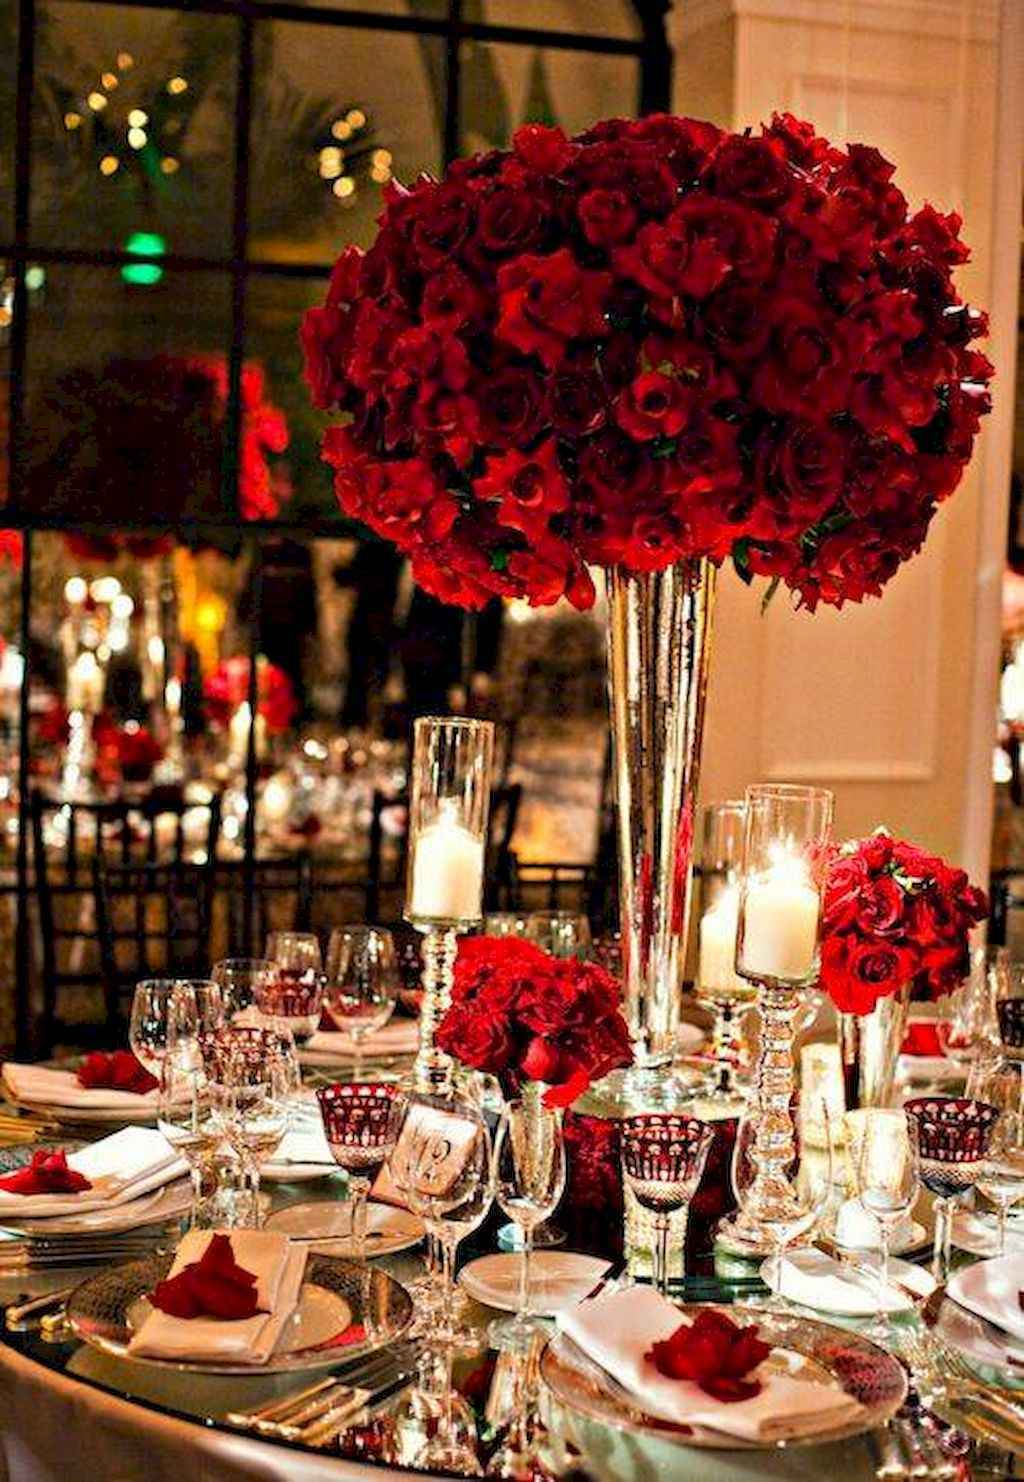 66 Romantic Valentines Table Settings Decor Ideas (30)